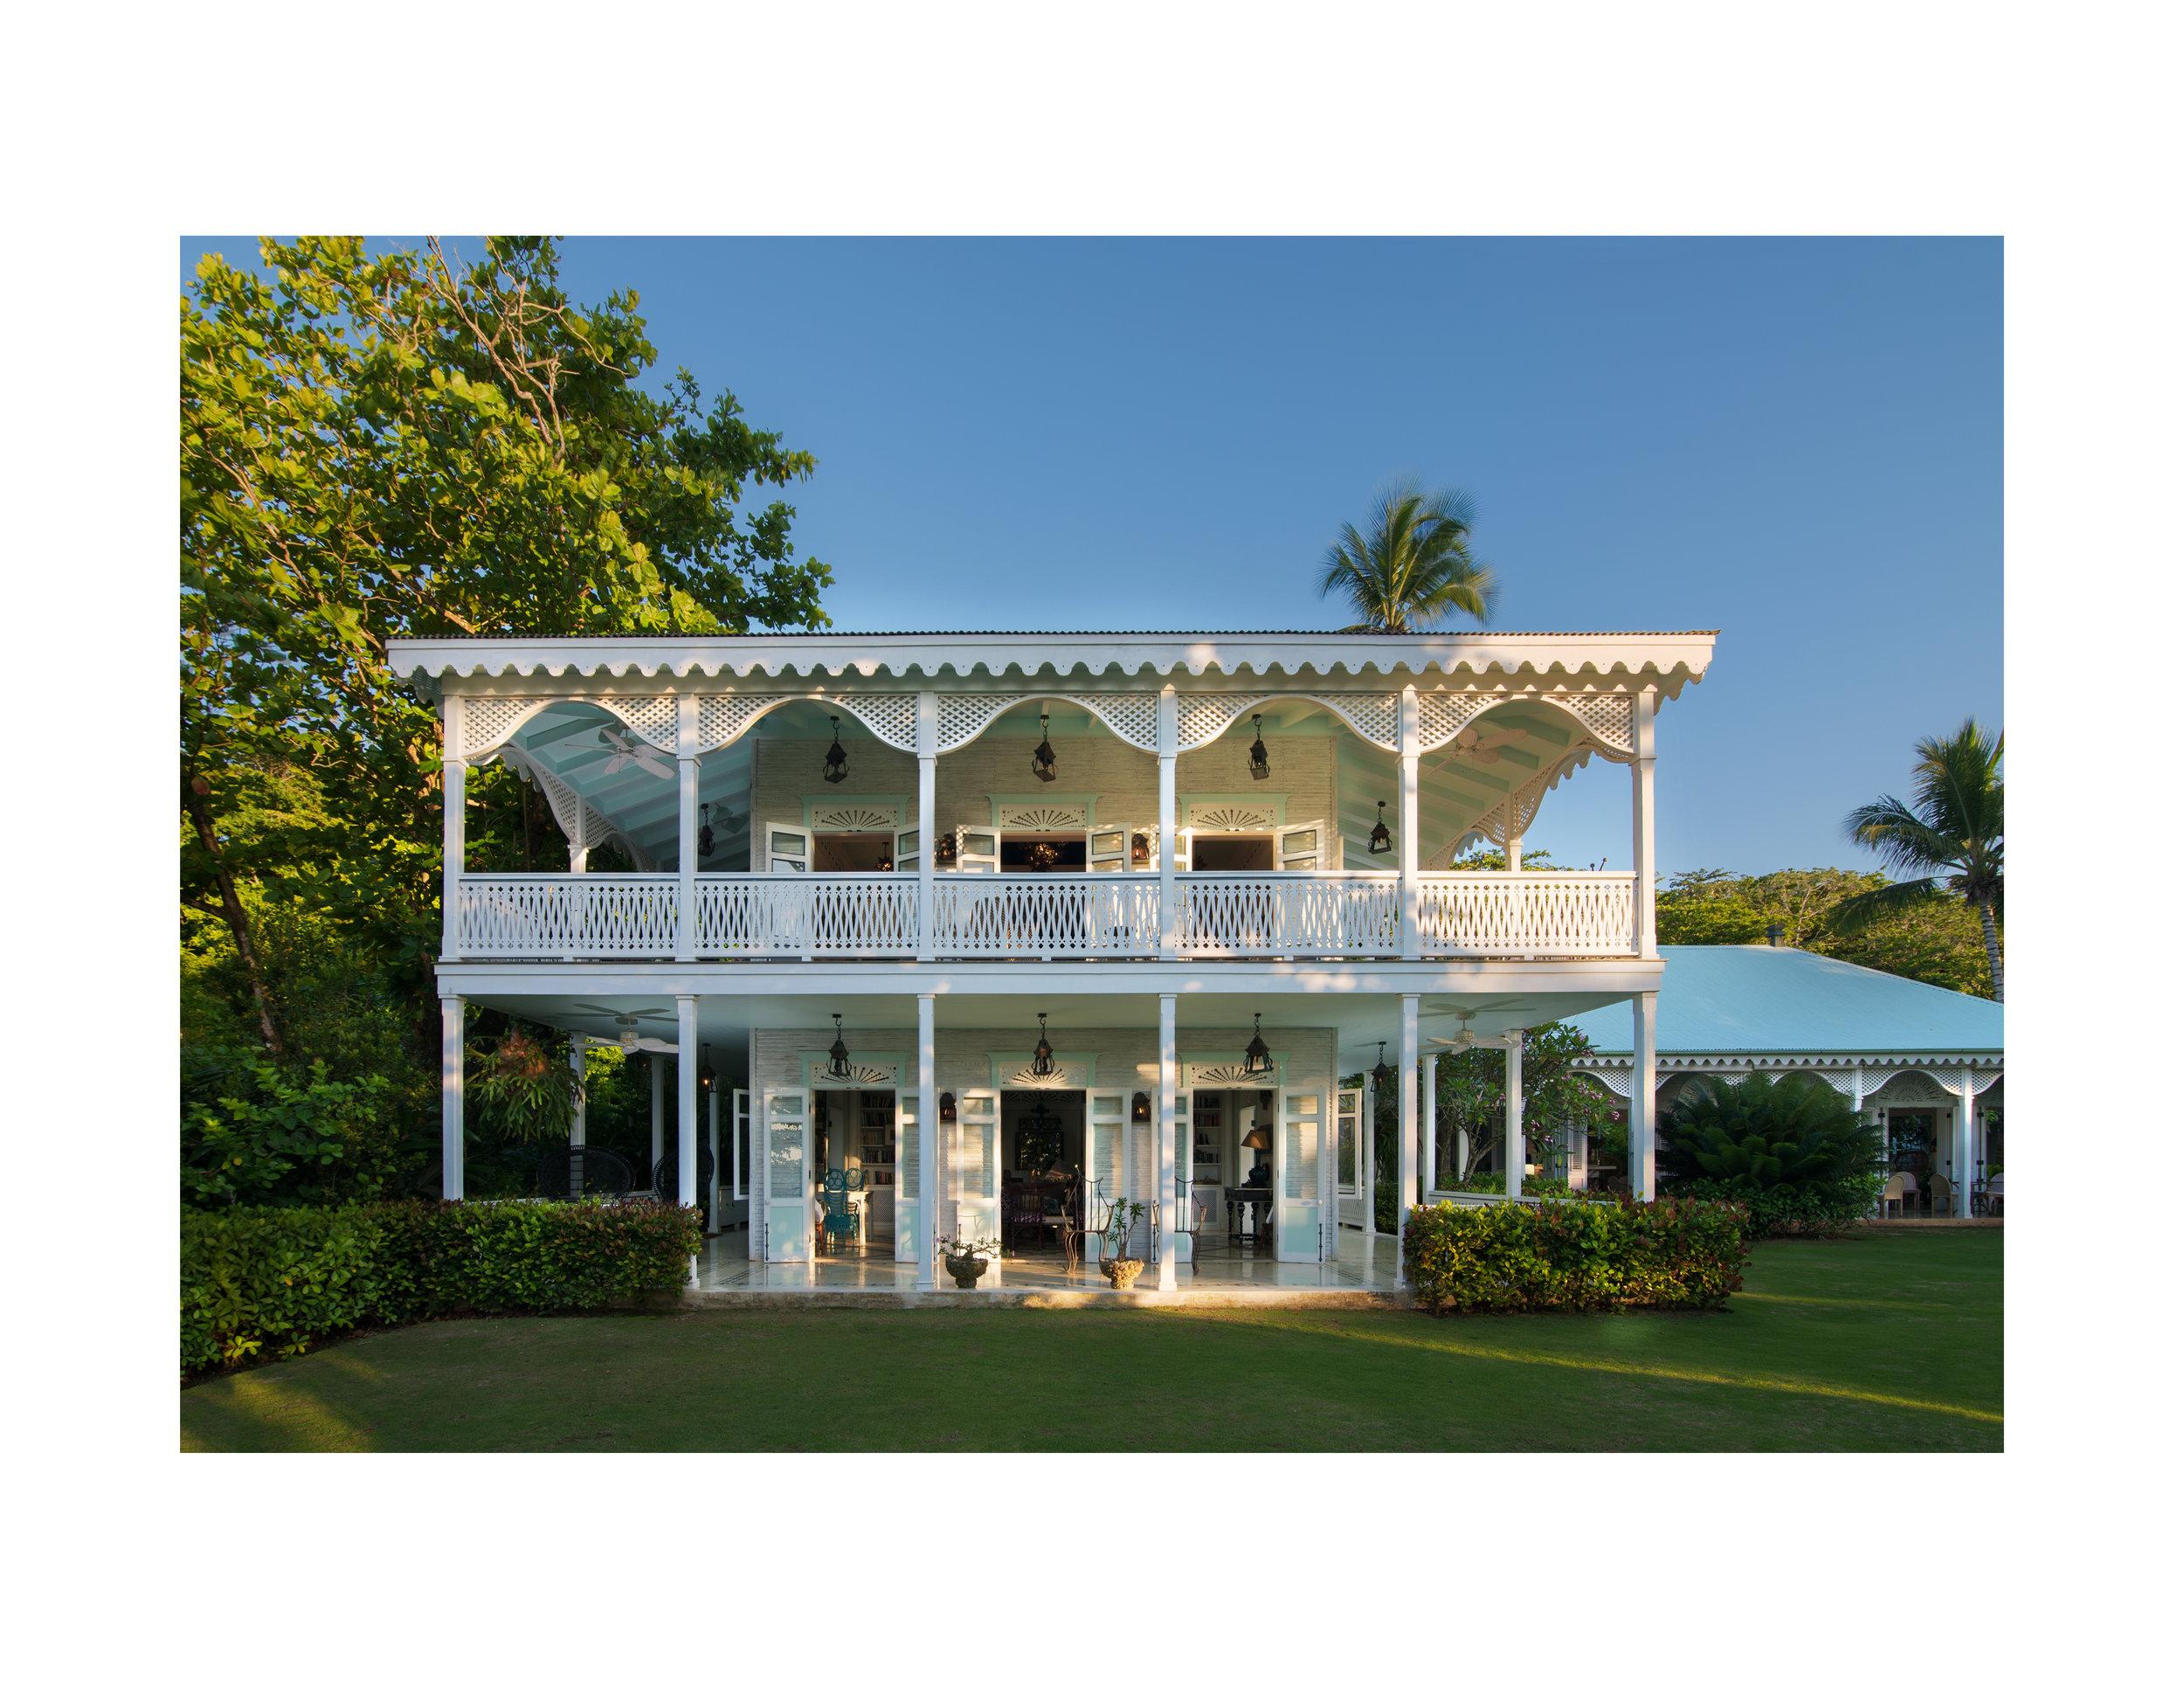 arquitectura colonial republica dominicana.jpg